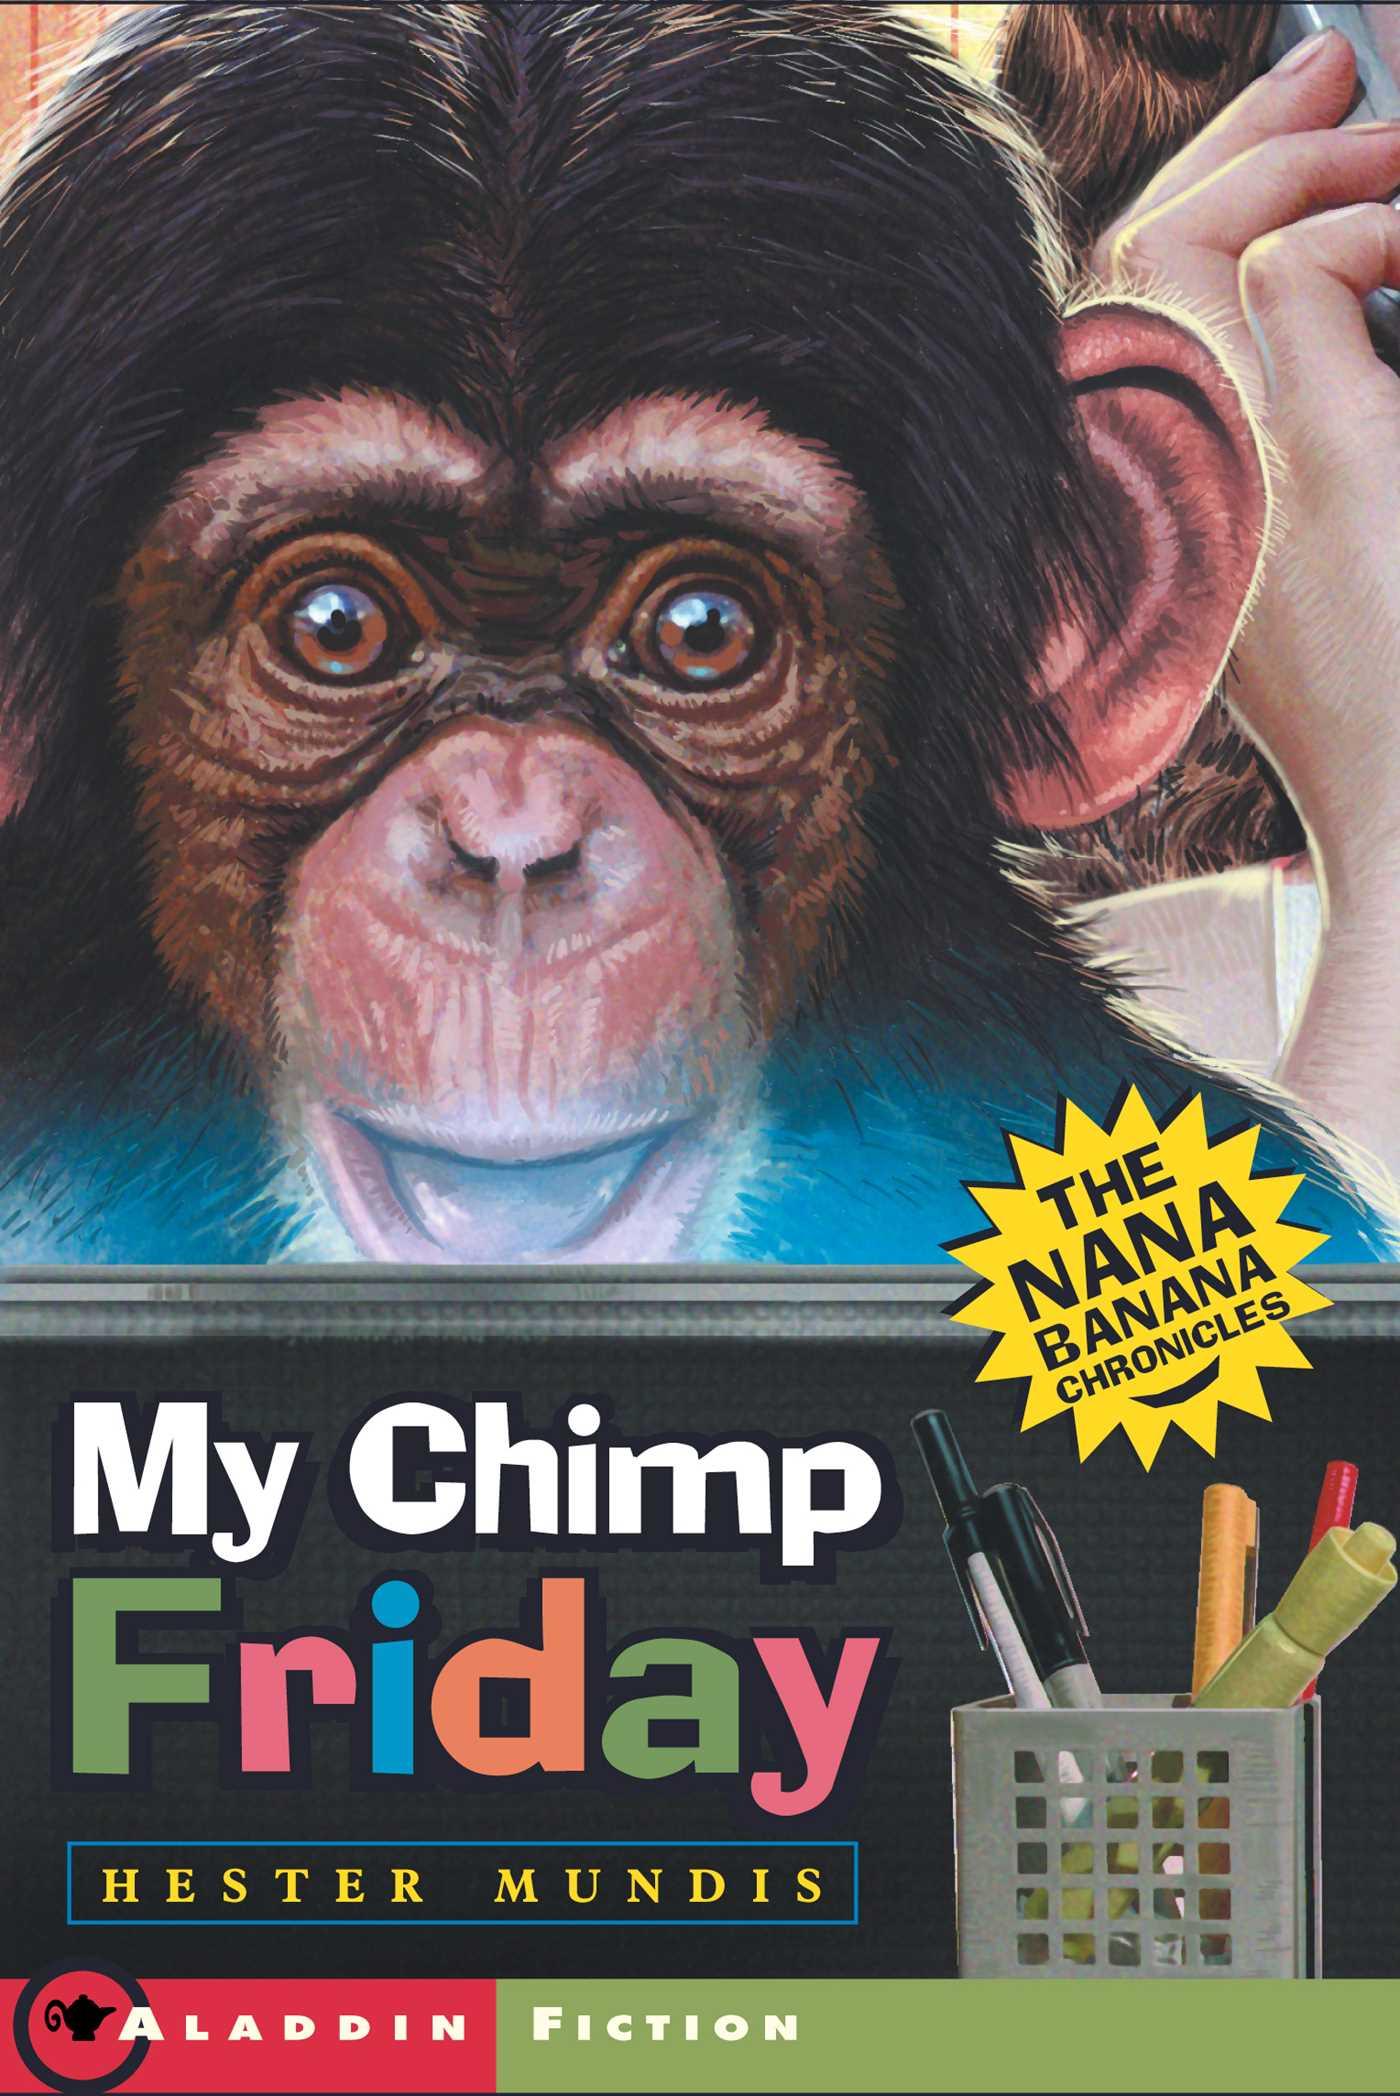 My chimp friday 9781442446304 hr